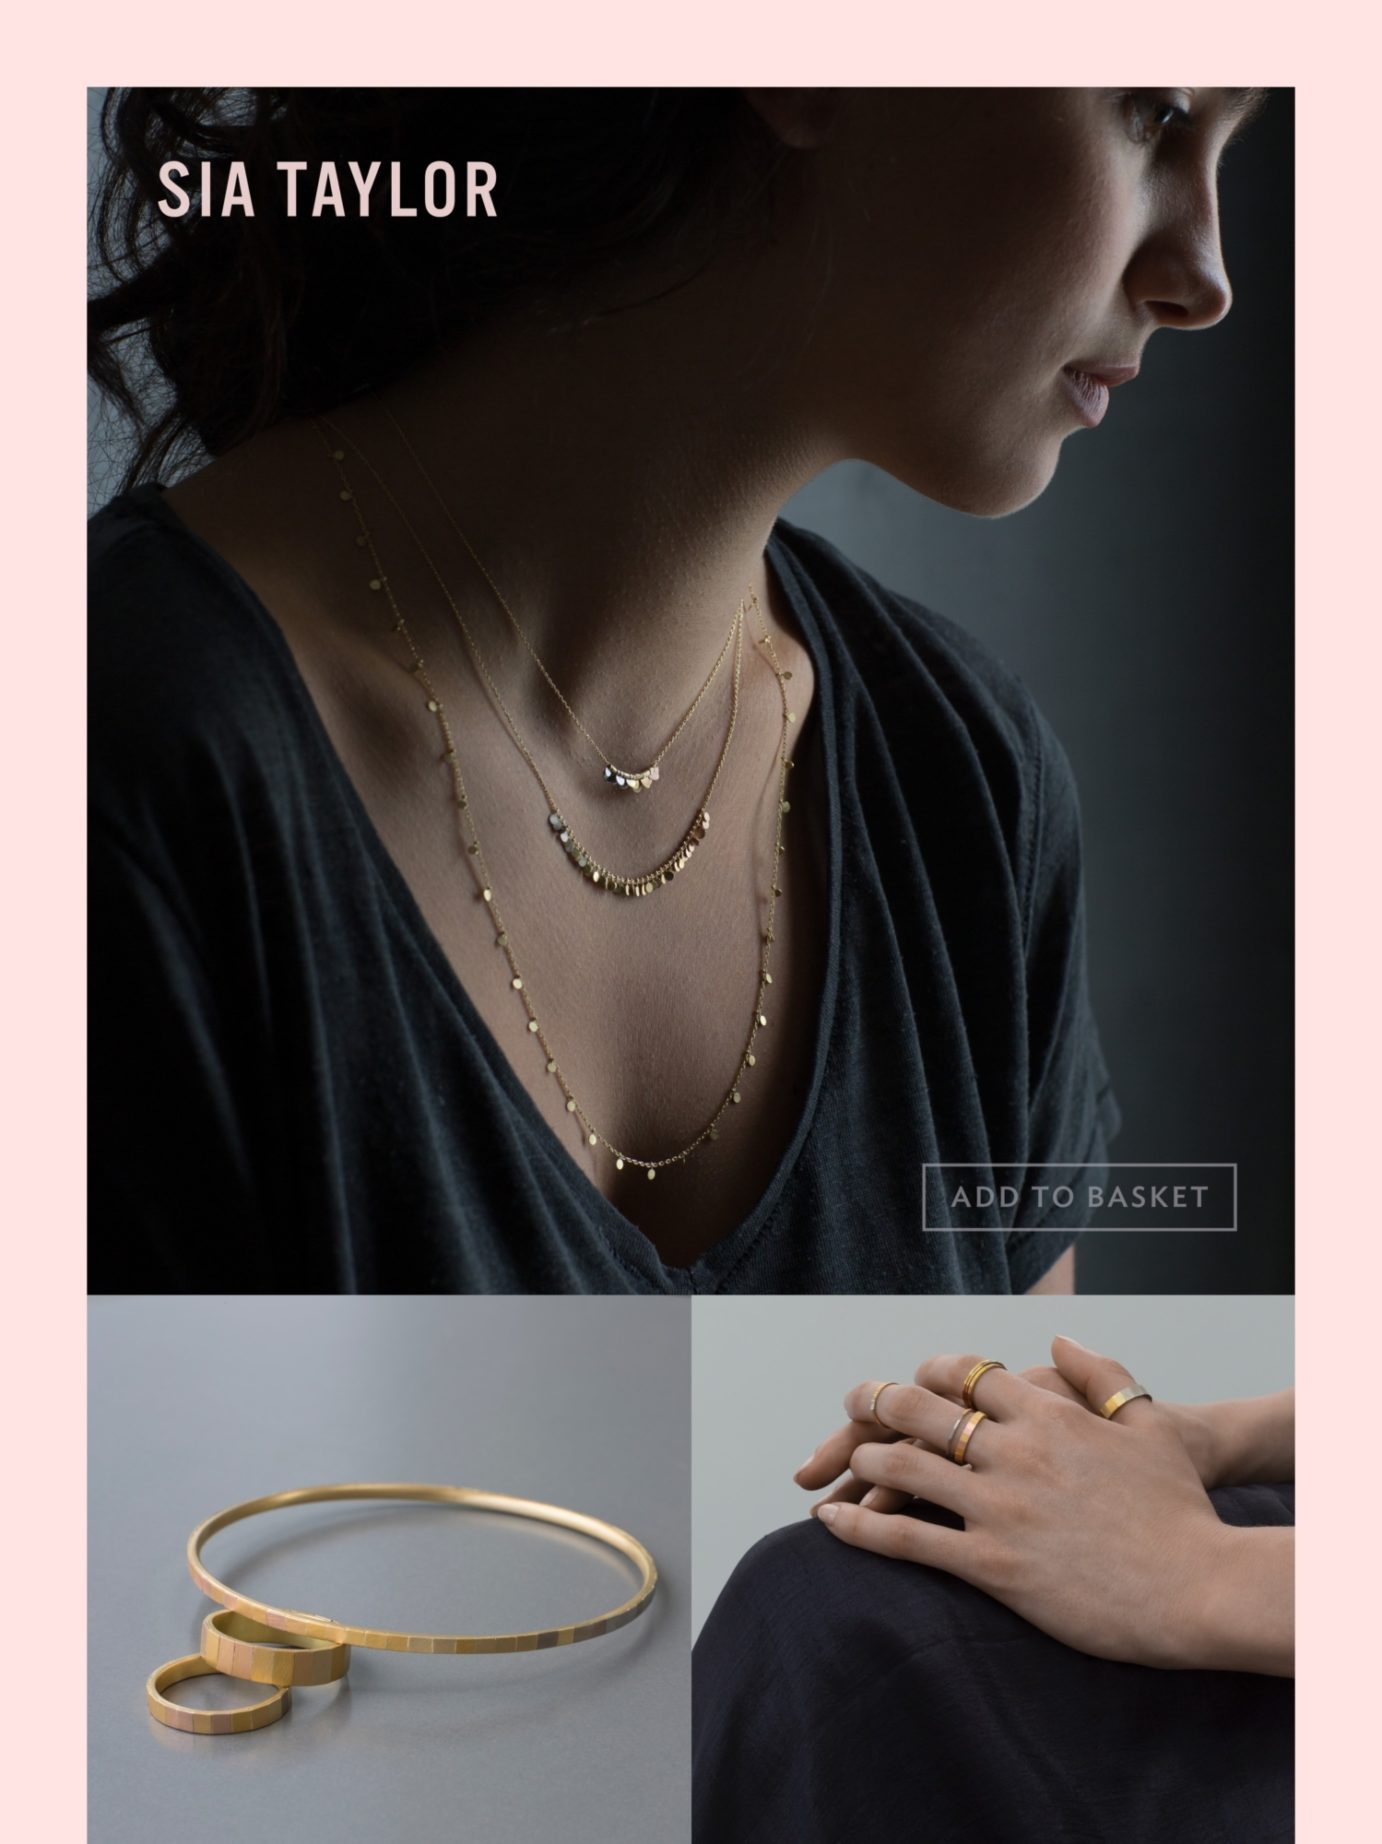 Sia Taylor Jewellery